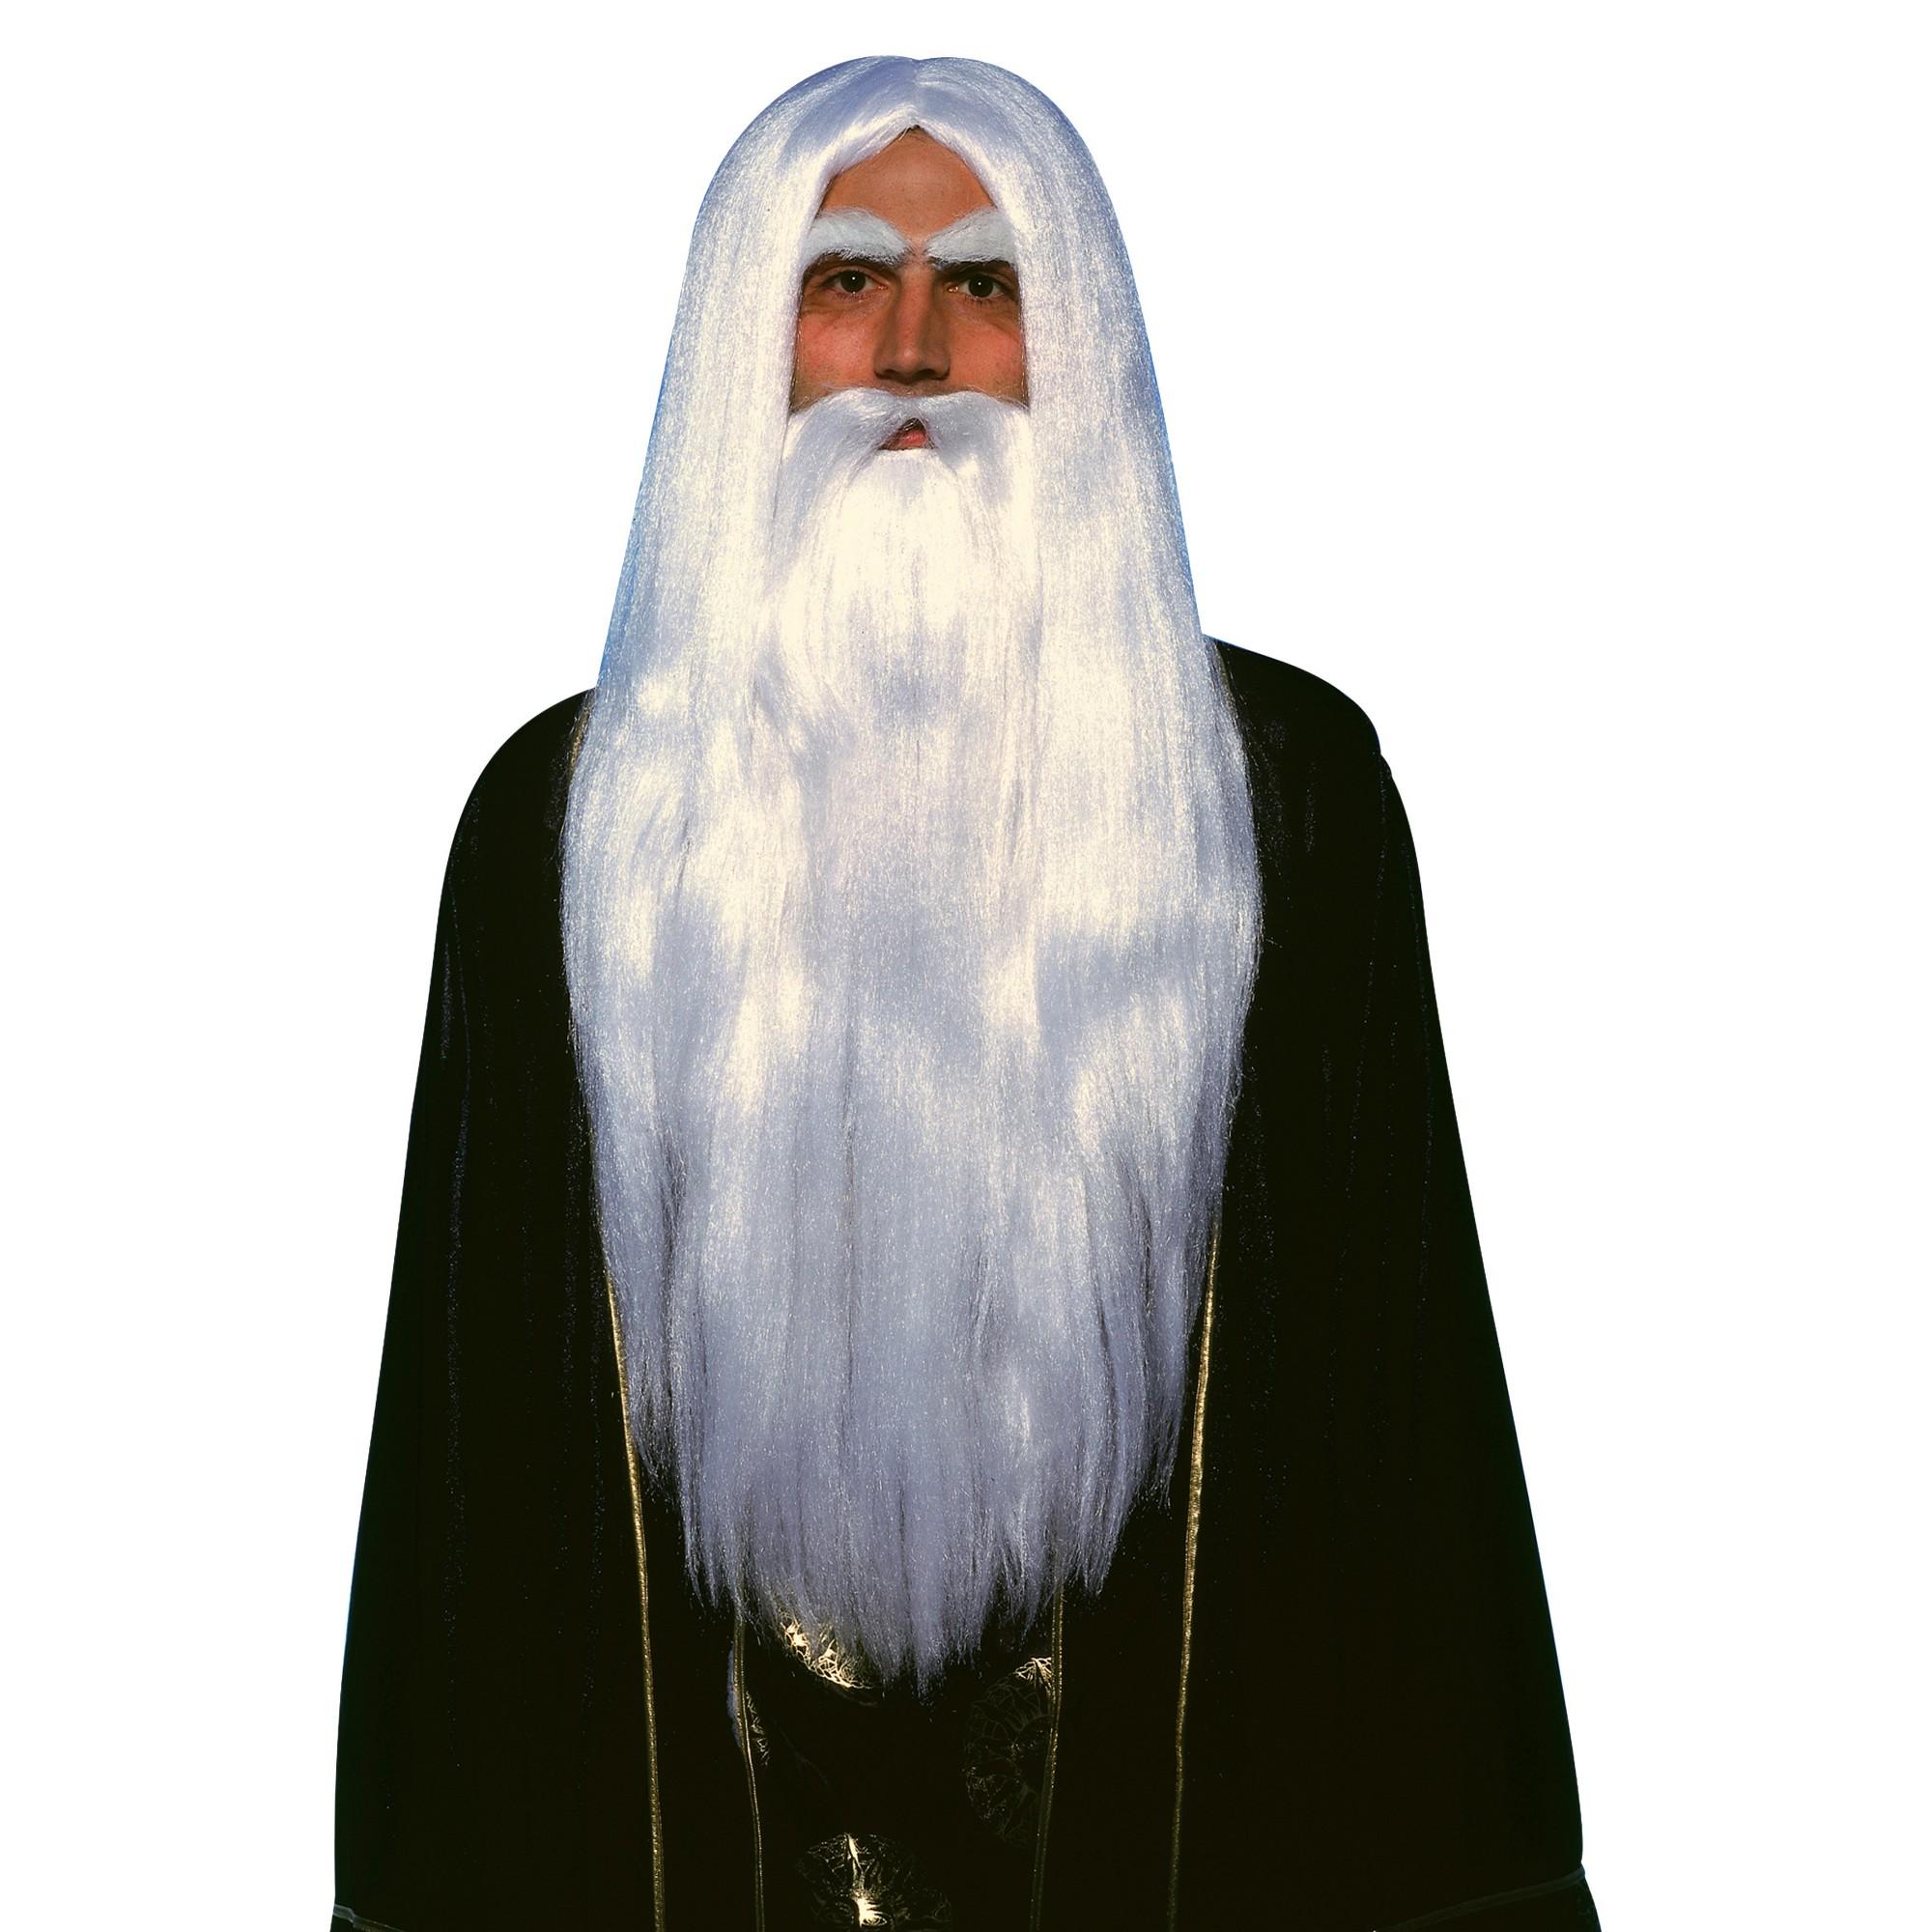 Halloween Merlin Wig and Beard, White Beard wig